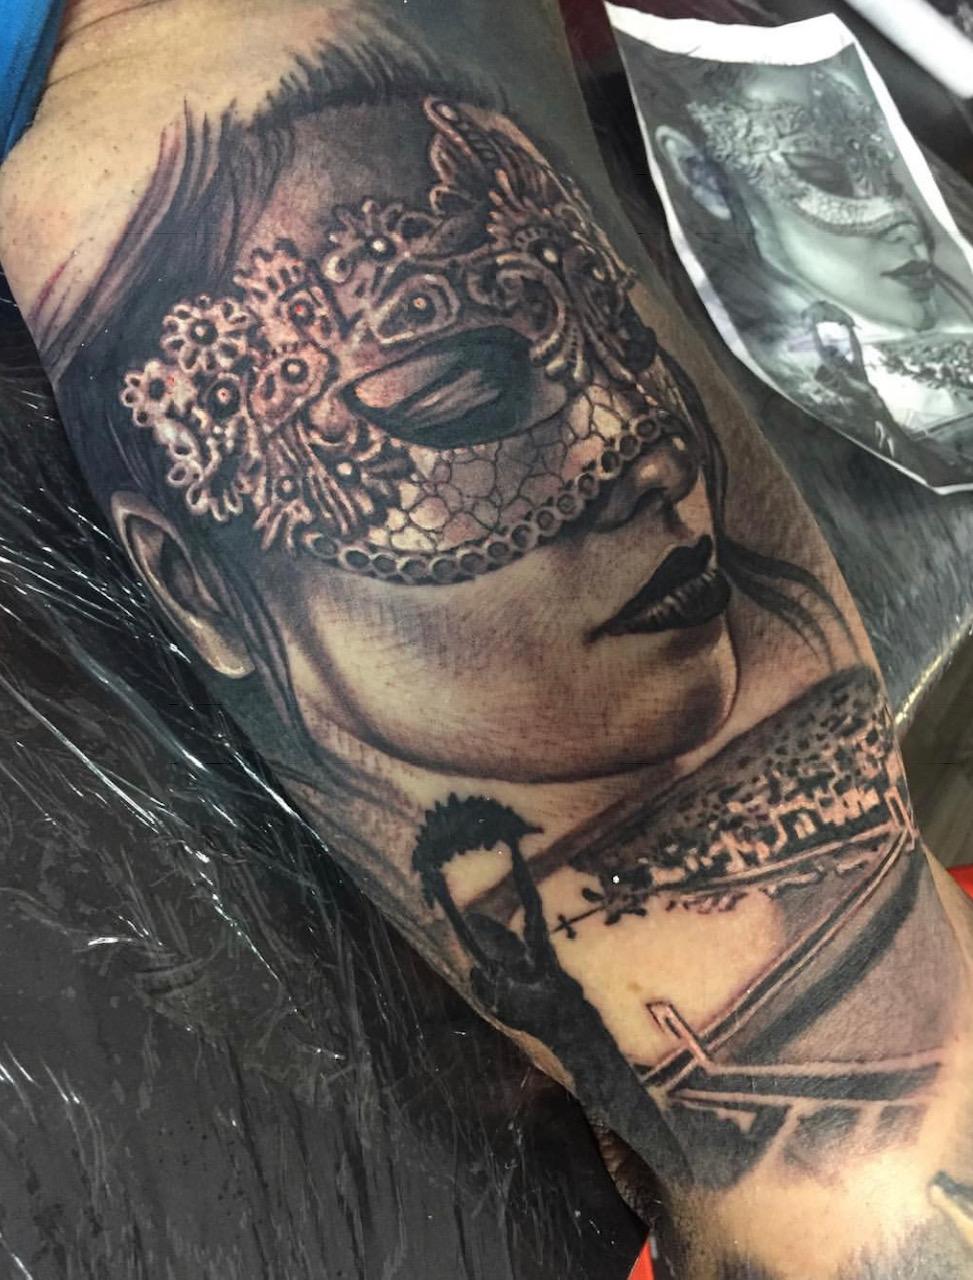 tattoo studio anansi münchen munich minga venice venezia theme Marci realistums artist tätowierer best